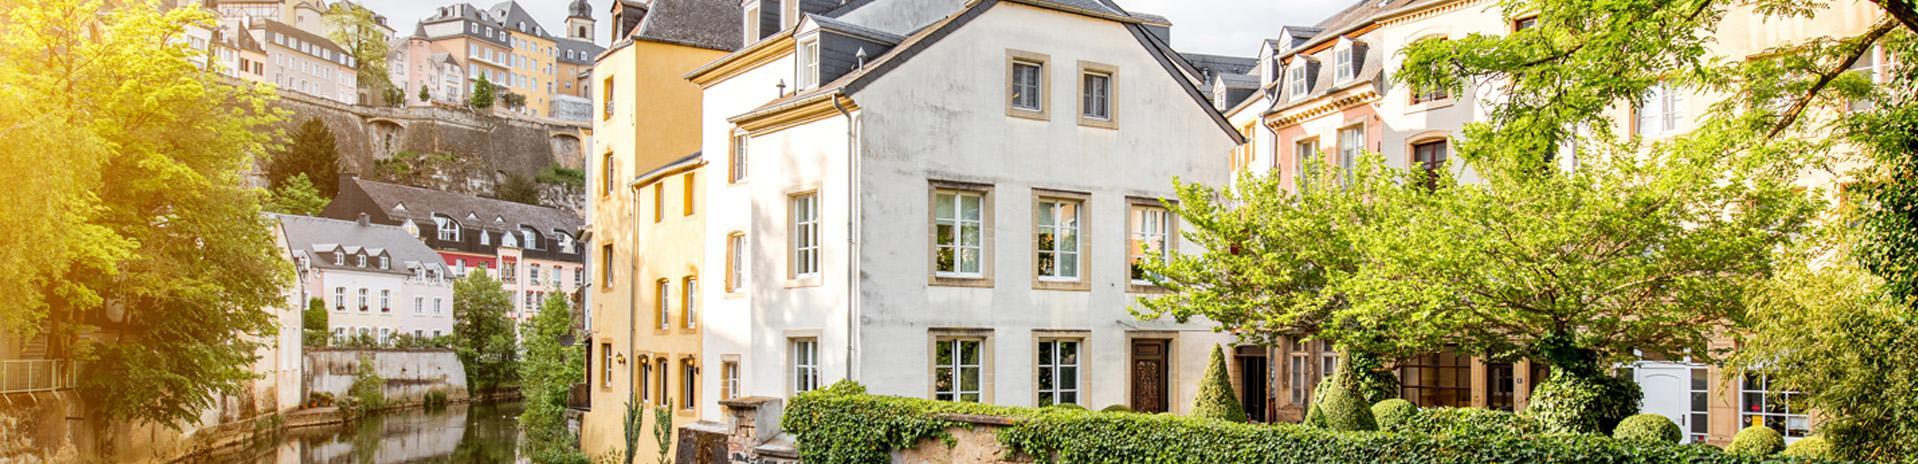 Maison au Luxembourg